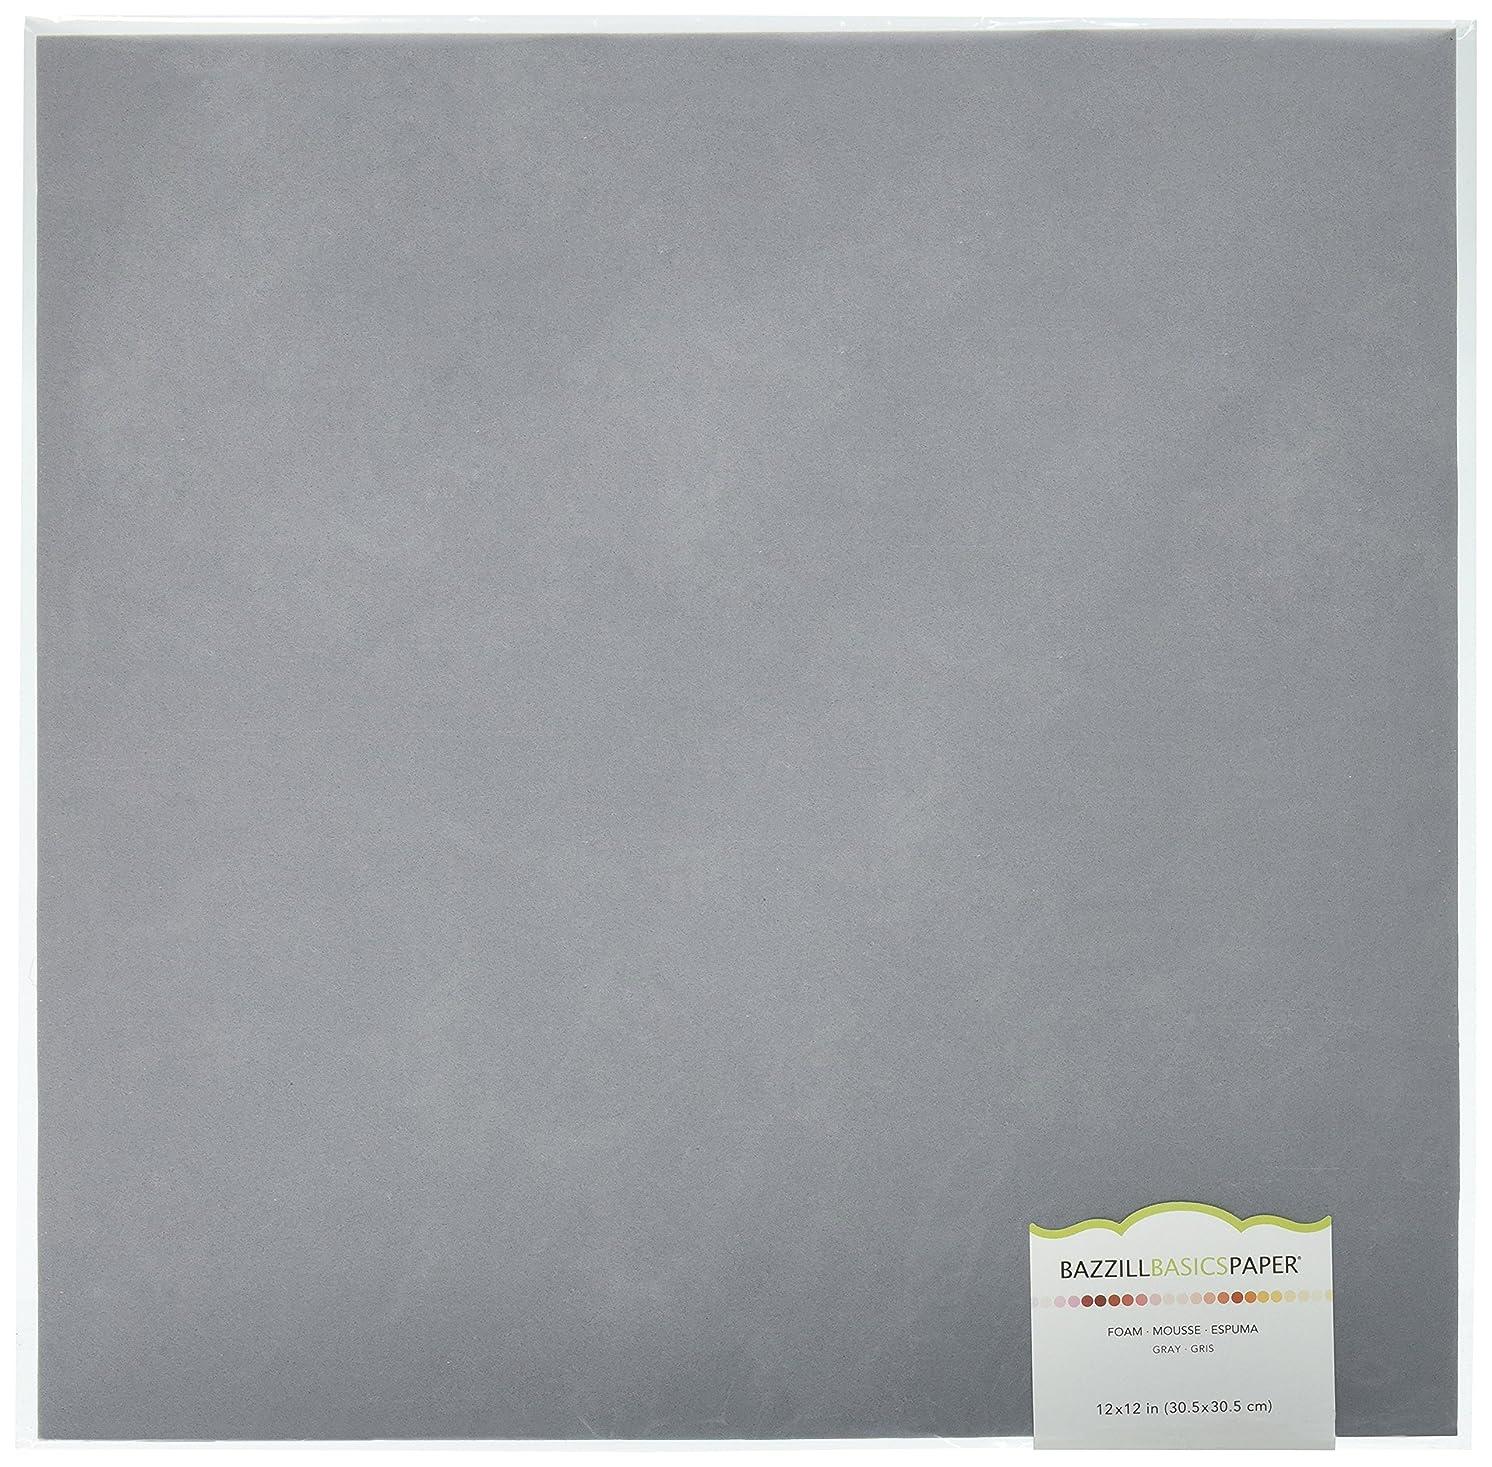 American Crafts Bazzill Basics Self Adhesive 2mm Foam Sheets, 12